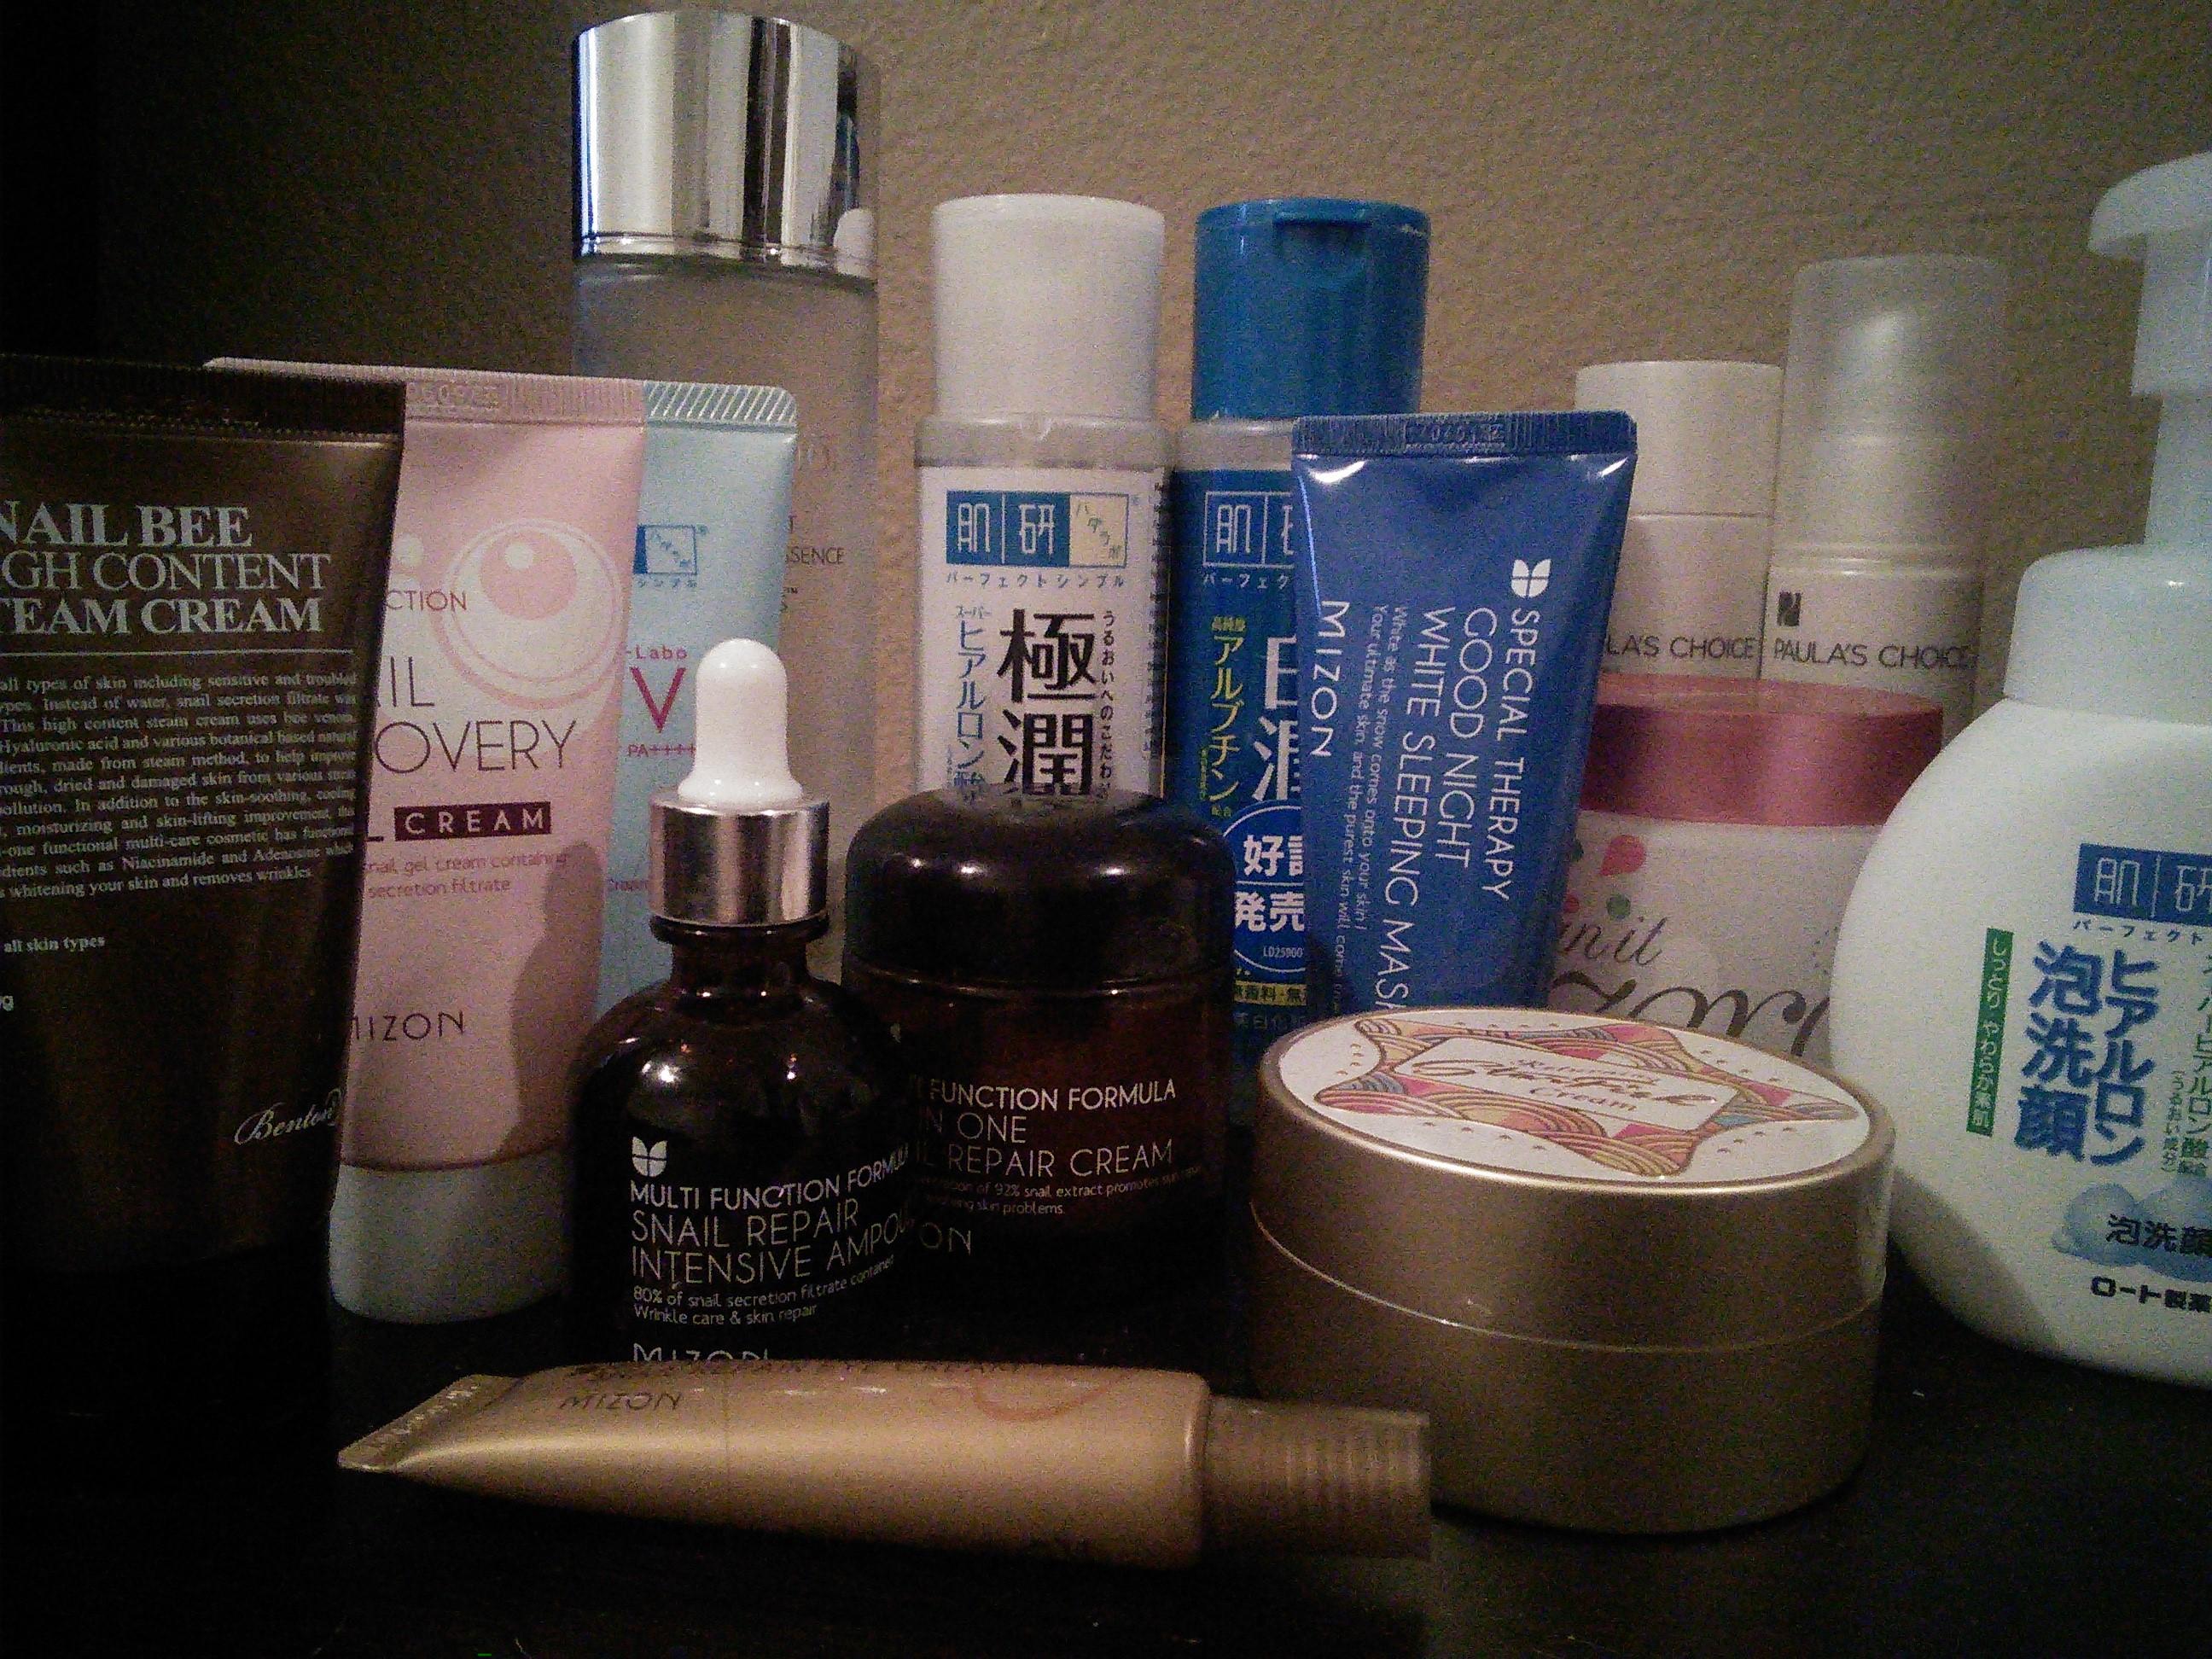 Spring Summer 2015 Routine Overhaul Status Complete Fifty Shades Benton Snail Bee High Content Essence 5 Gram Winter Korean Skin Care